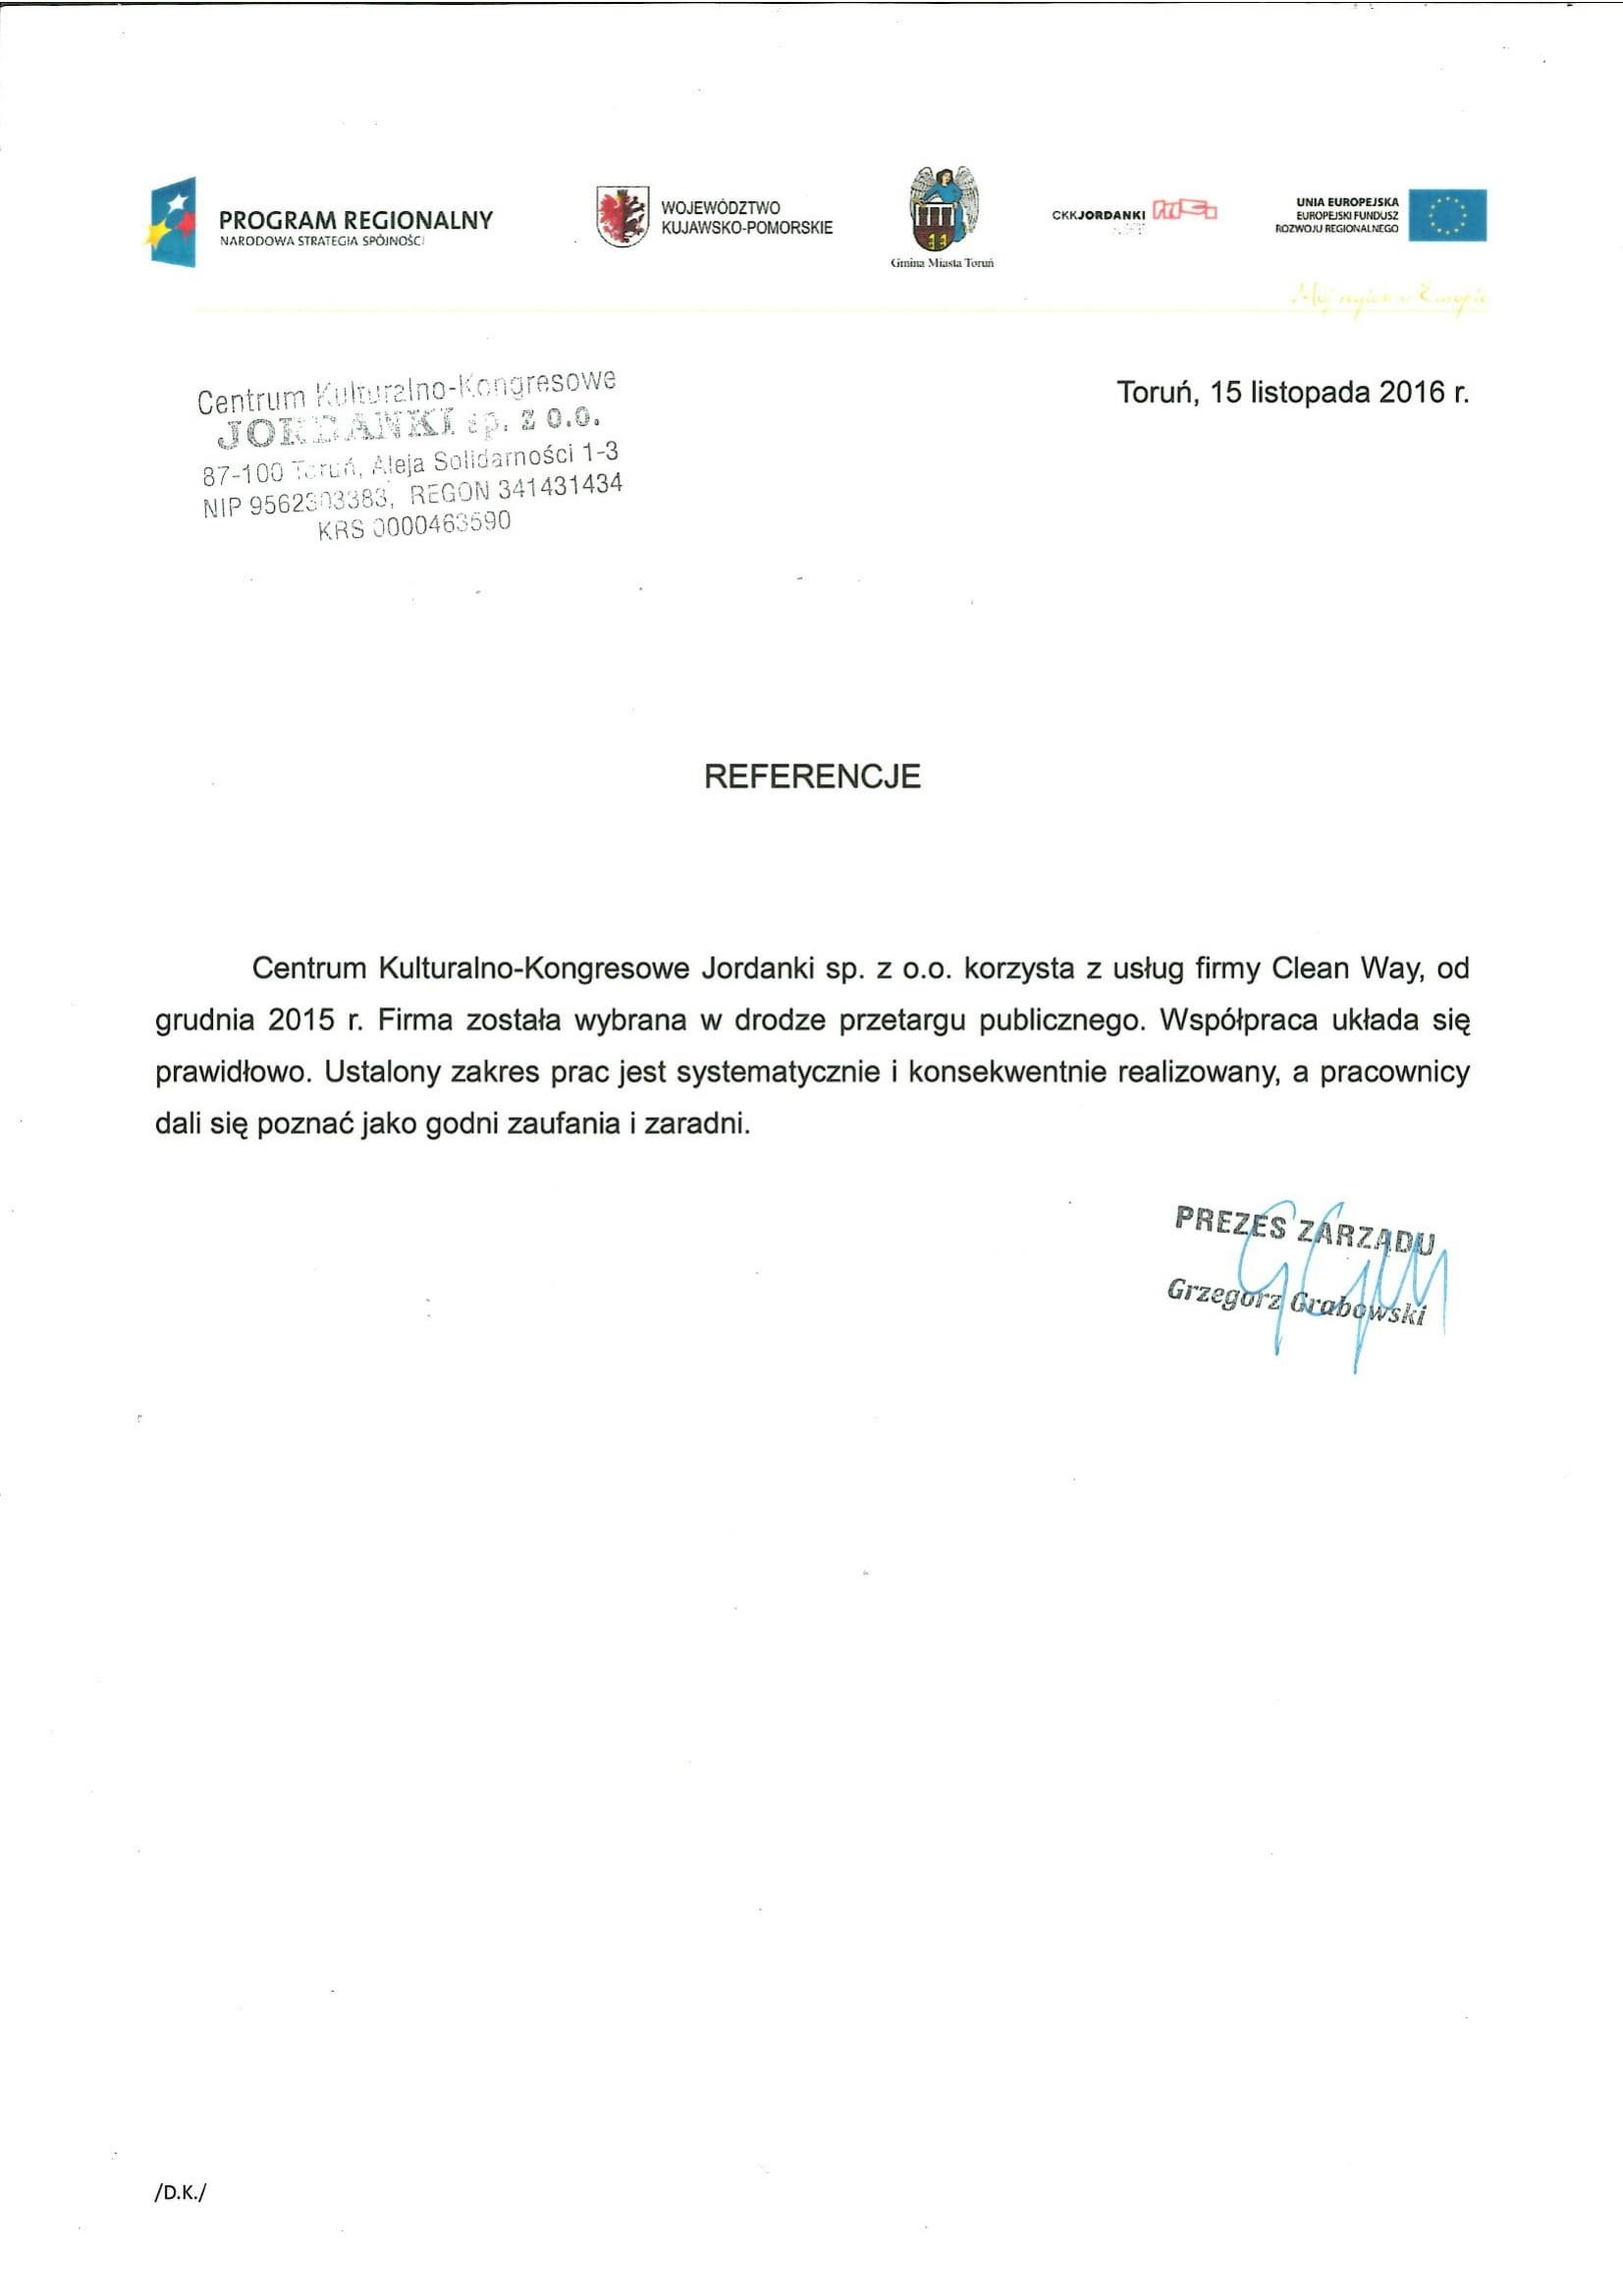 Centrum Kulturalno-Kongresowe Jordanki sp. z o.o.